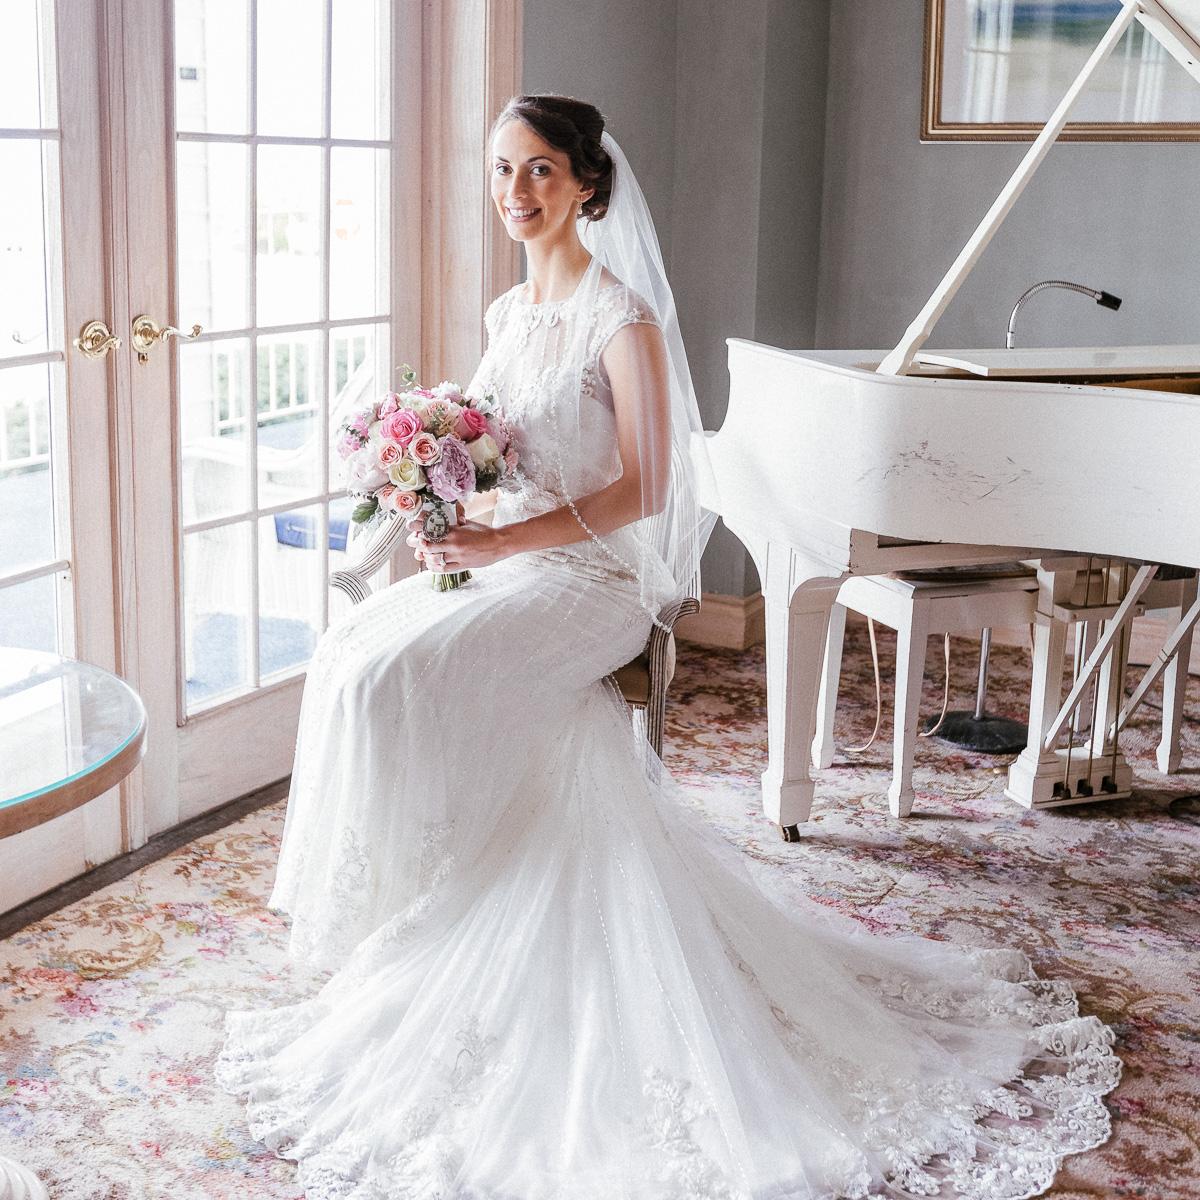 Spring _Lake_New_Jersey_wedding_photography_Peter_Rigo_Photography___66_web.jpg